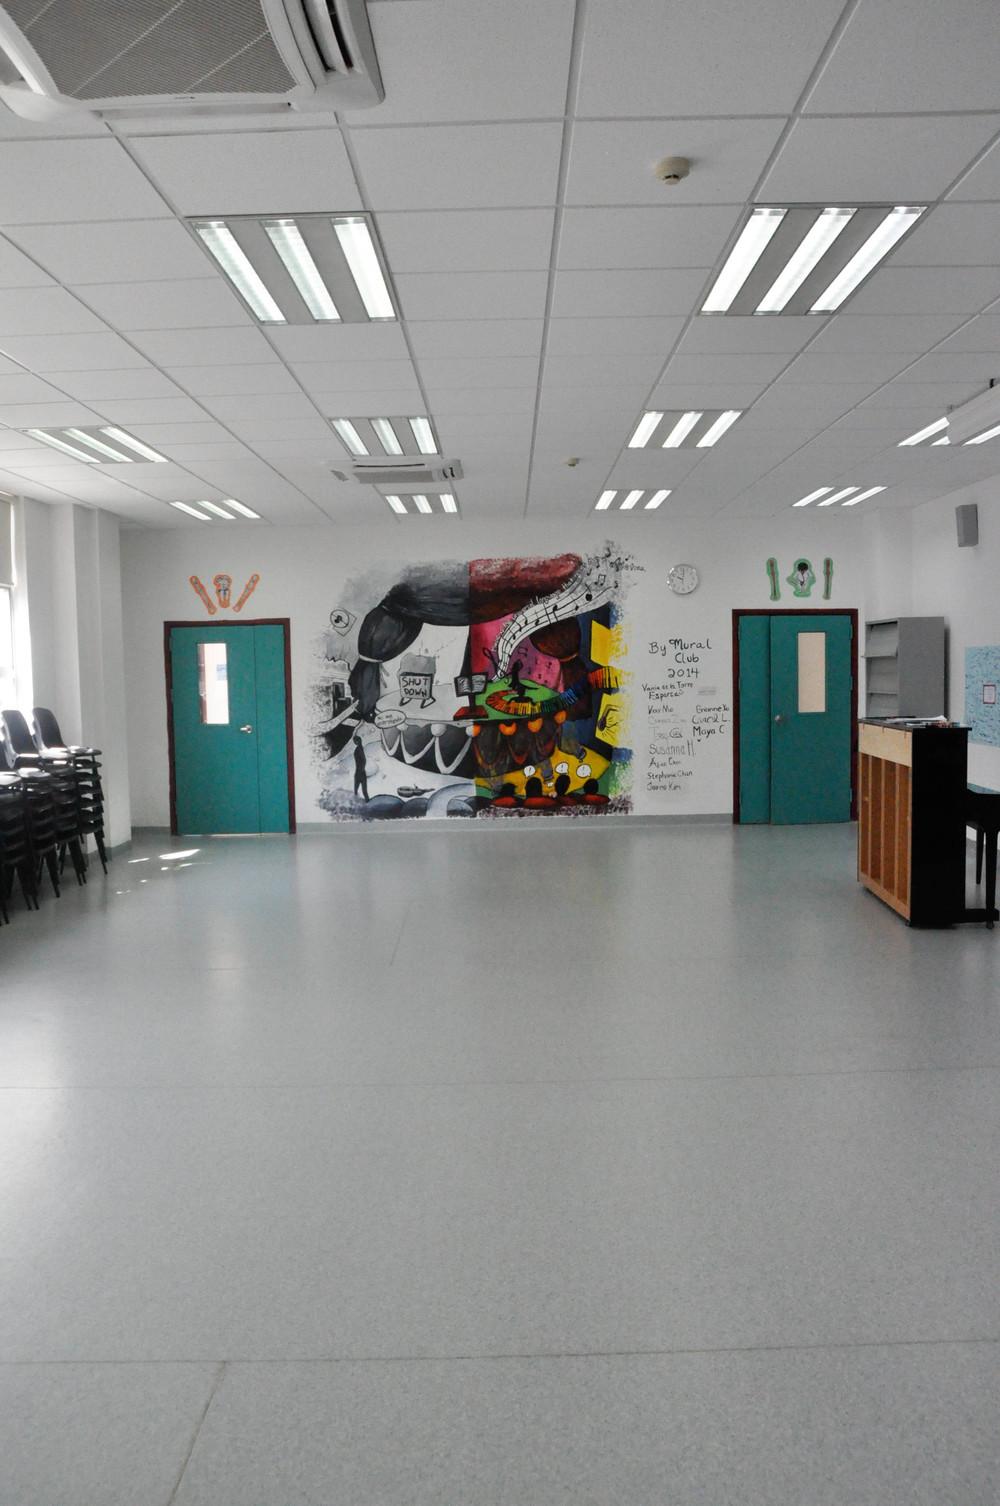 Elementary Music Room